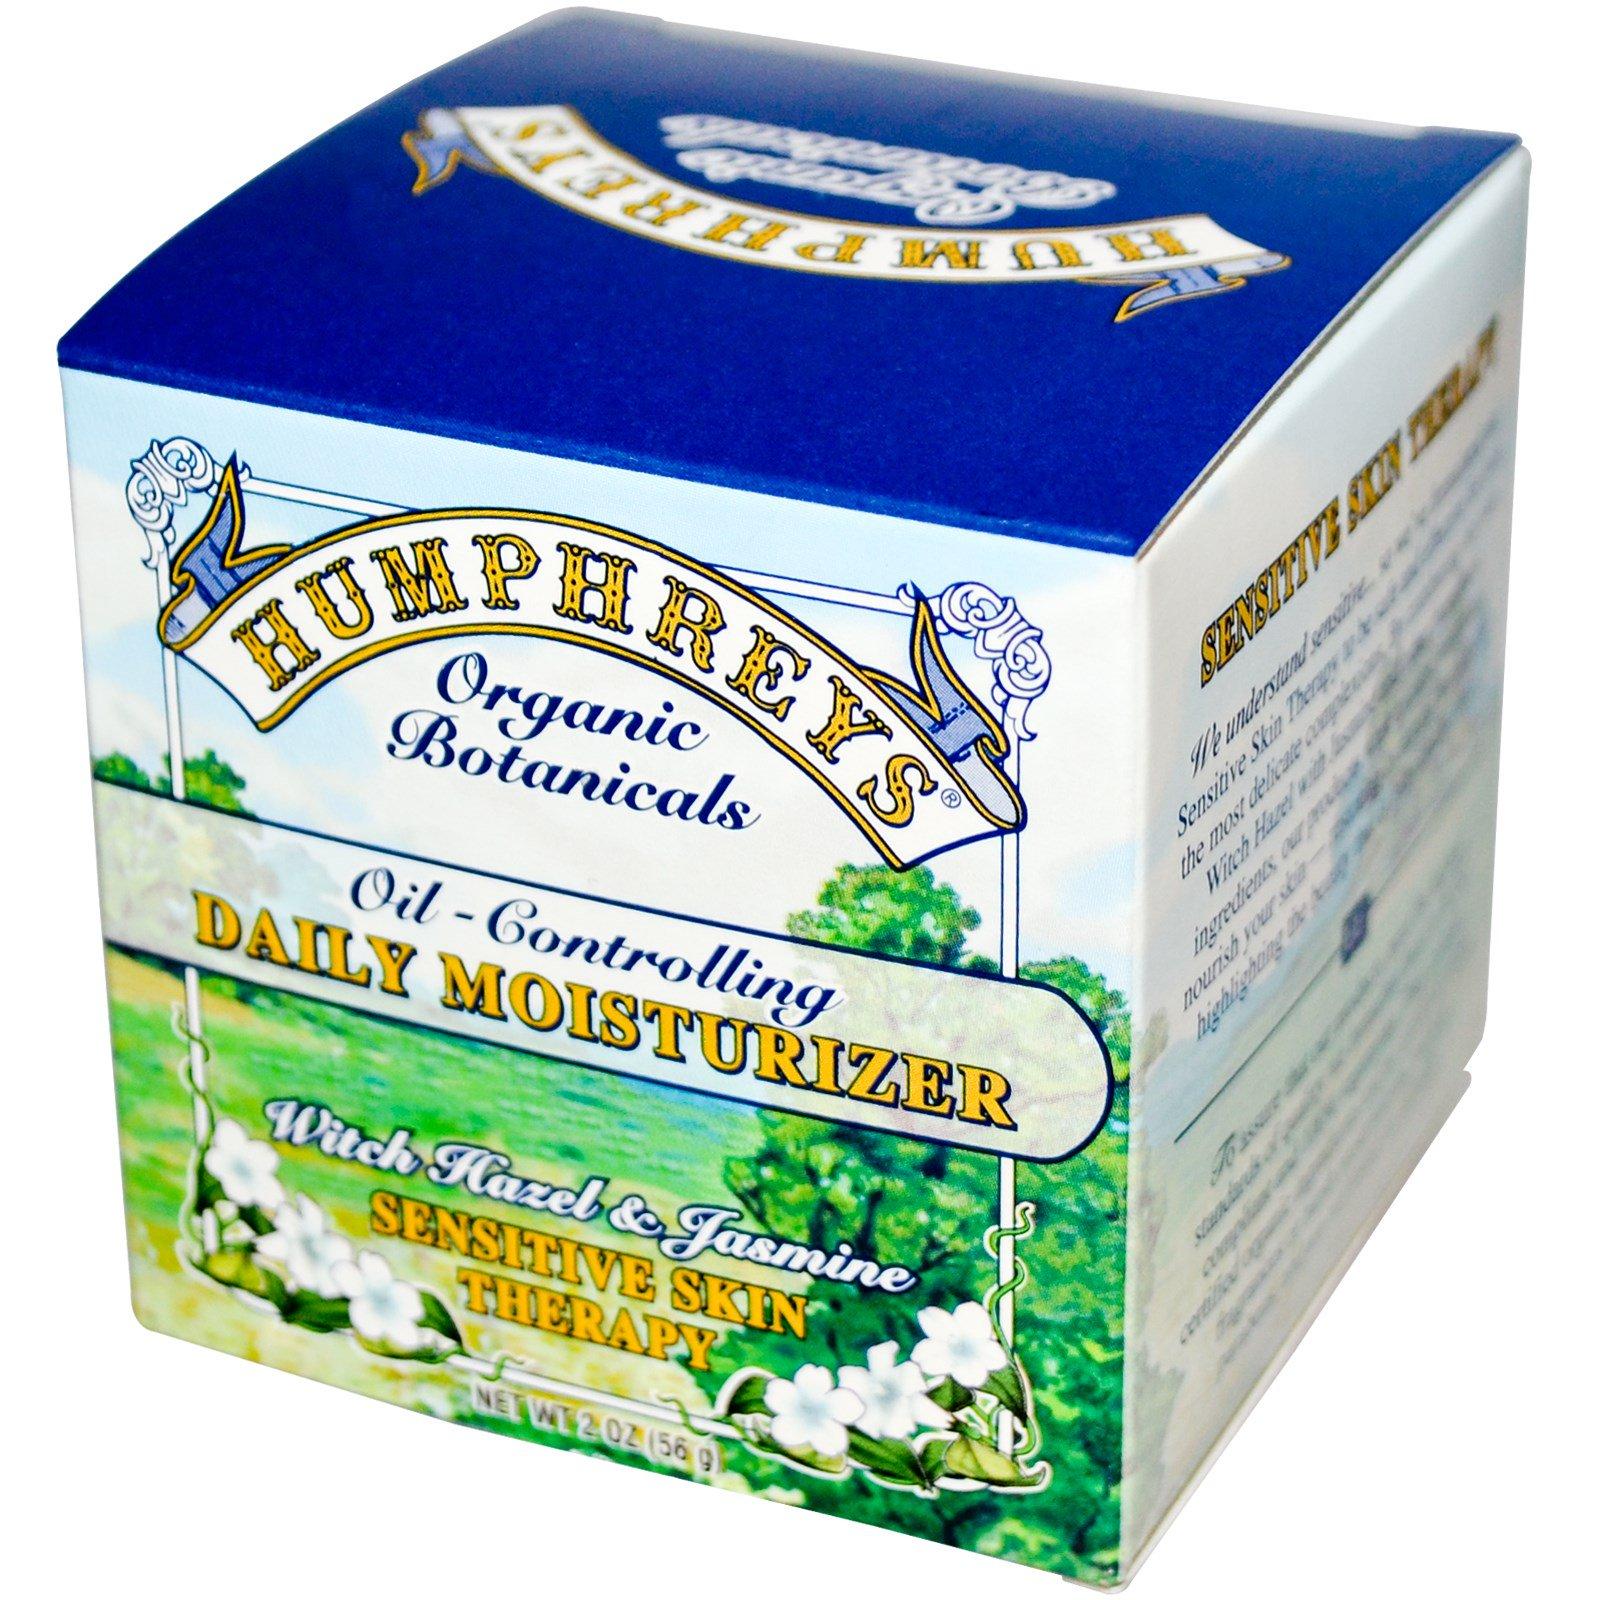 Humphreys Oil Controlling Daily Moisturizer Witch Hazel Jasmine Humphrey Skin Care Activated Charcoal Bodywash 500ml 2 Oz